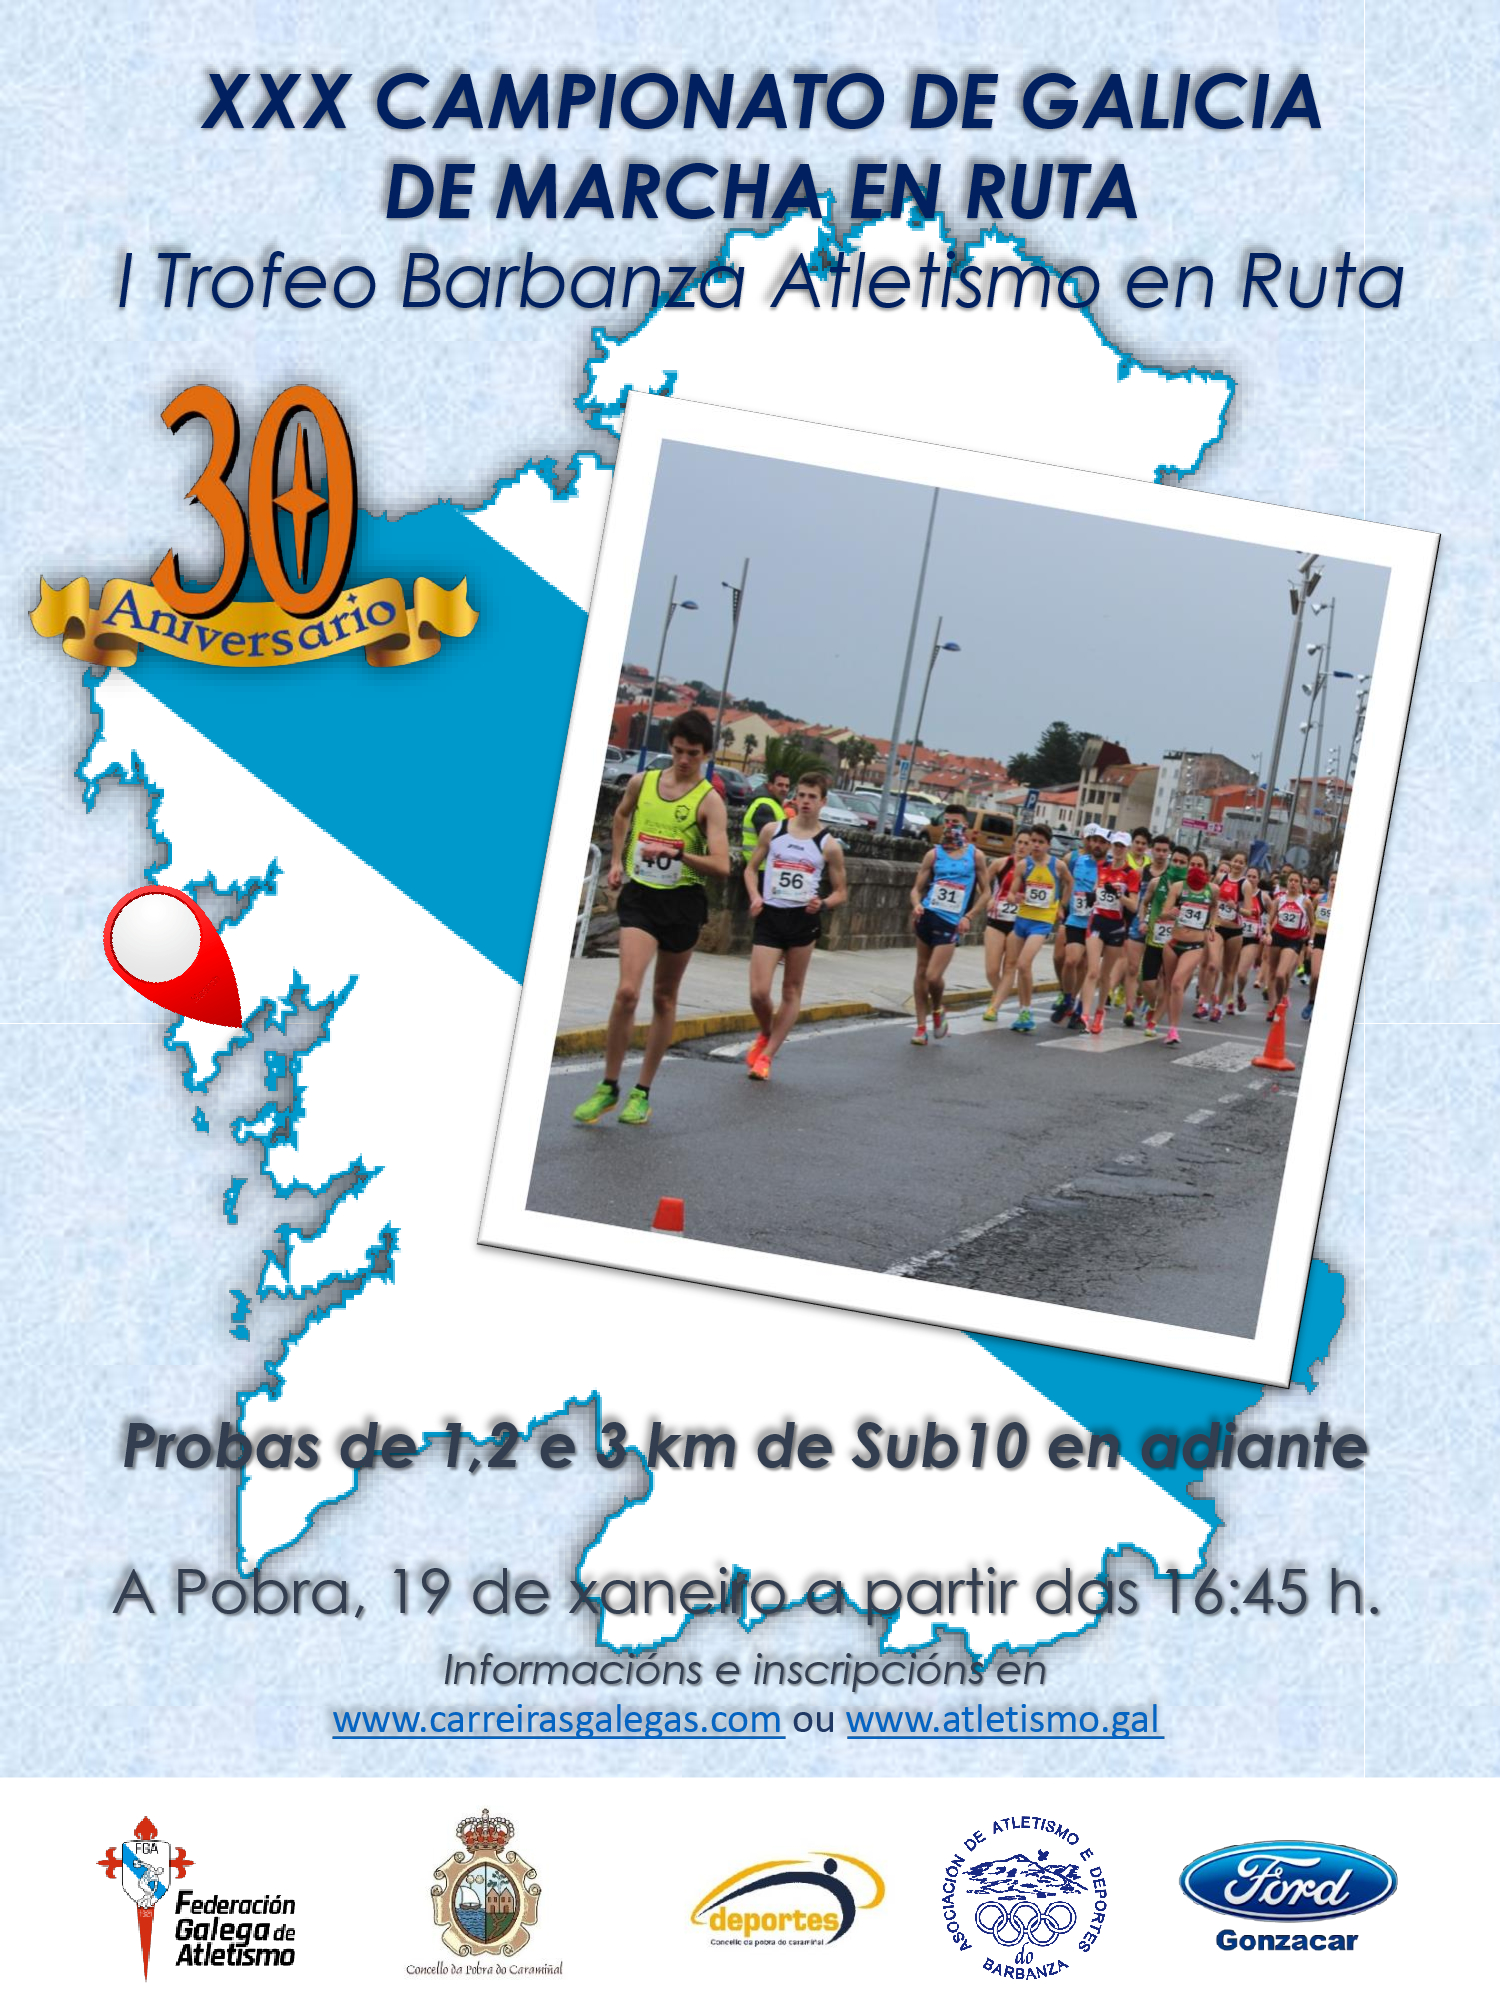 I Trofeo Barbanza de Atletismo en Ruta